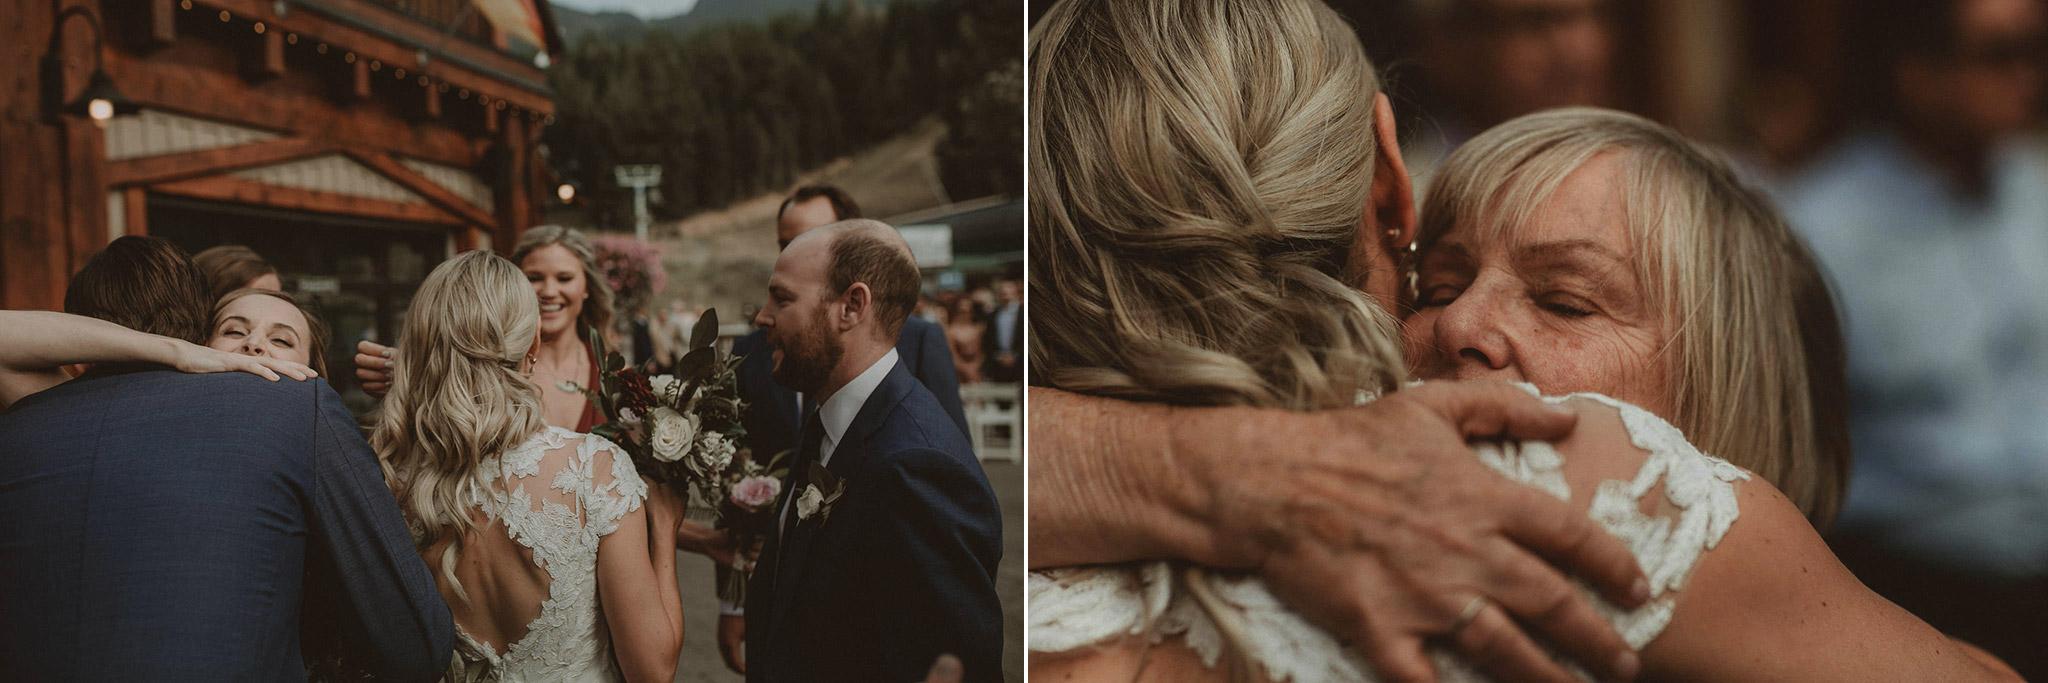 Vancouver-Whistler-wedding-photographer-011